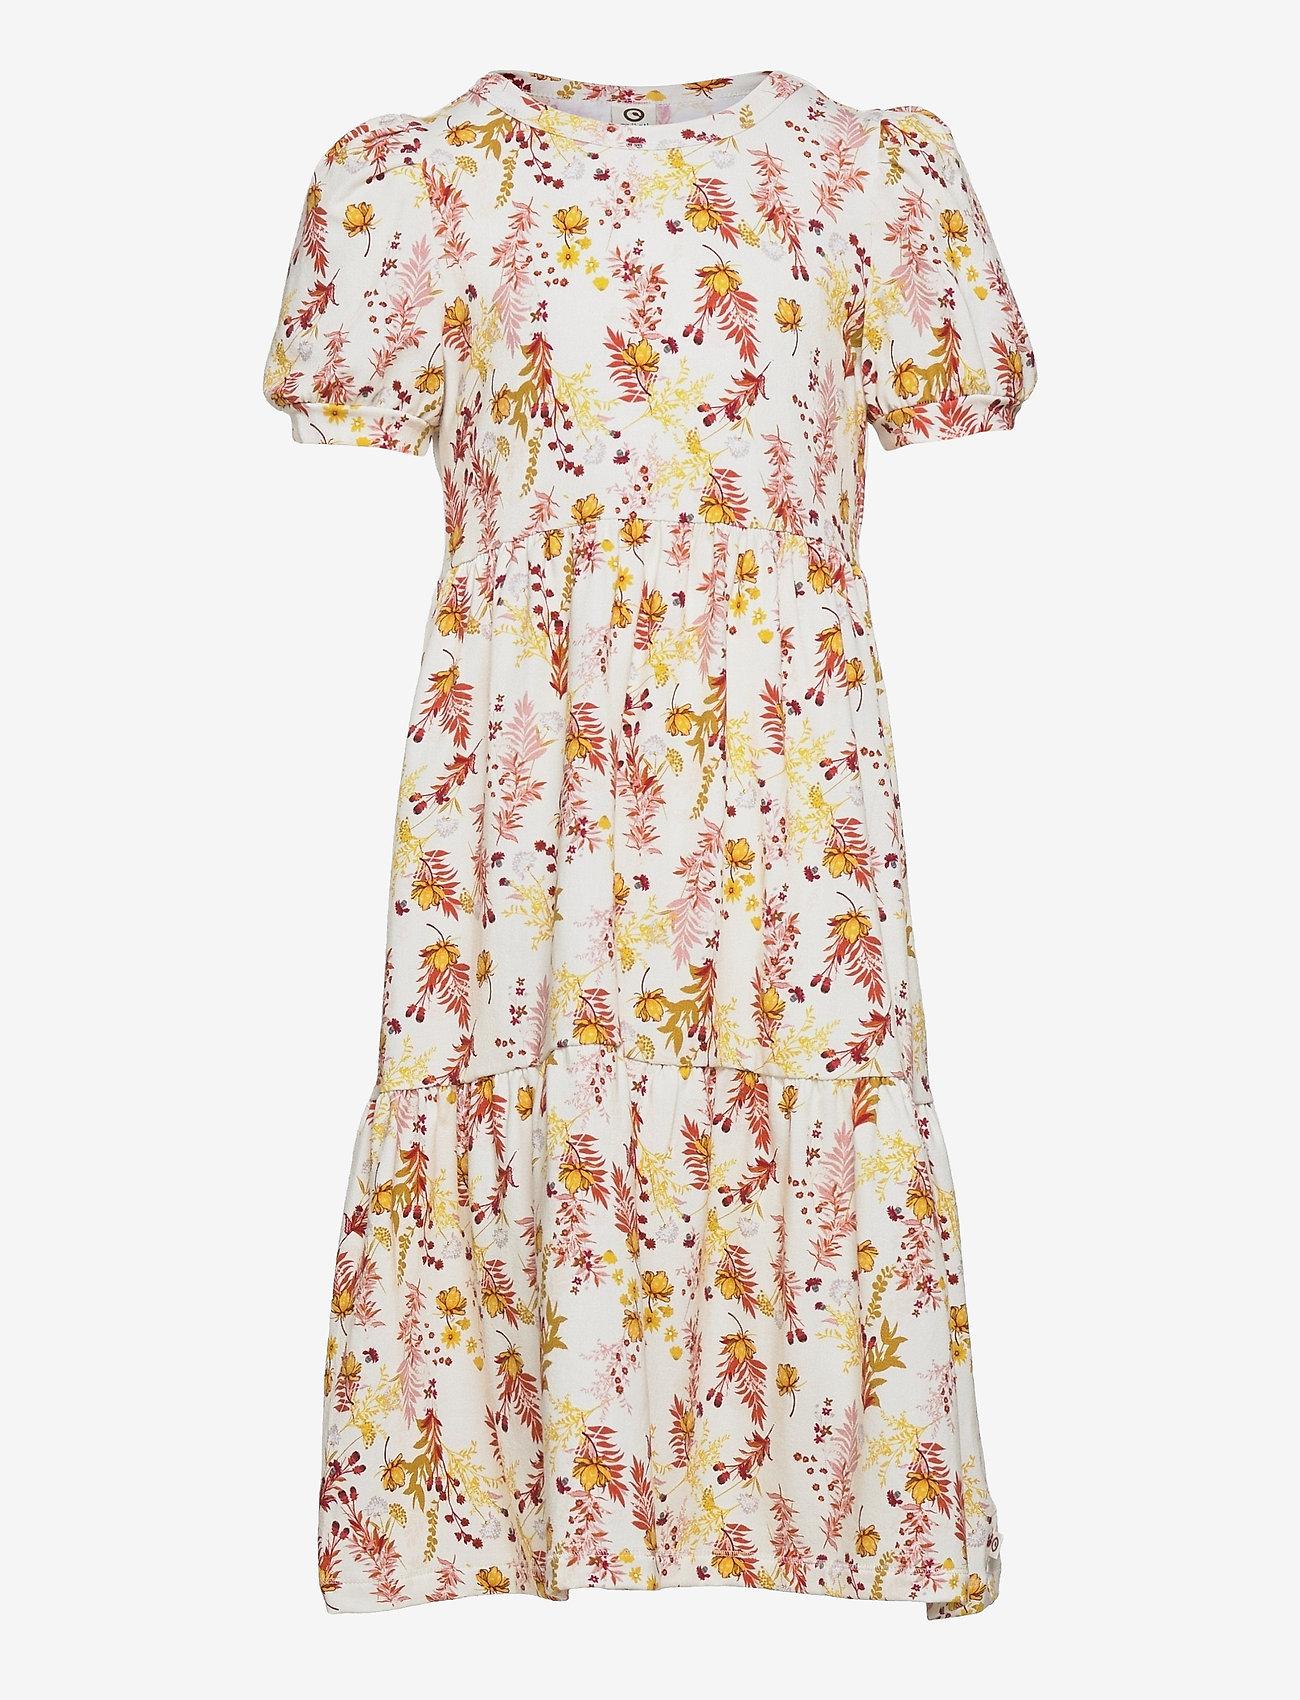 Müsli by Green Cotton - Calendula dress - kleider - cream - 0